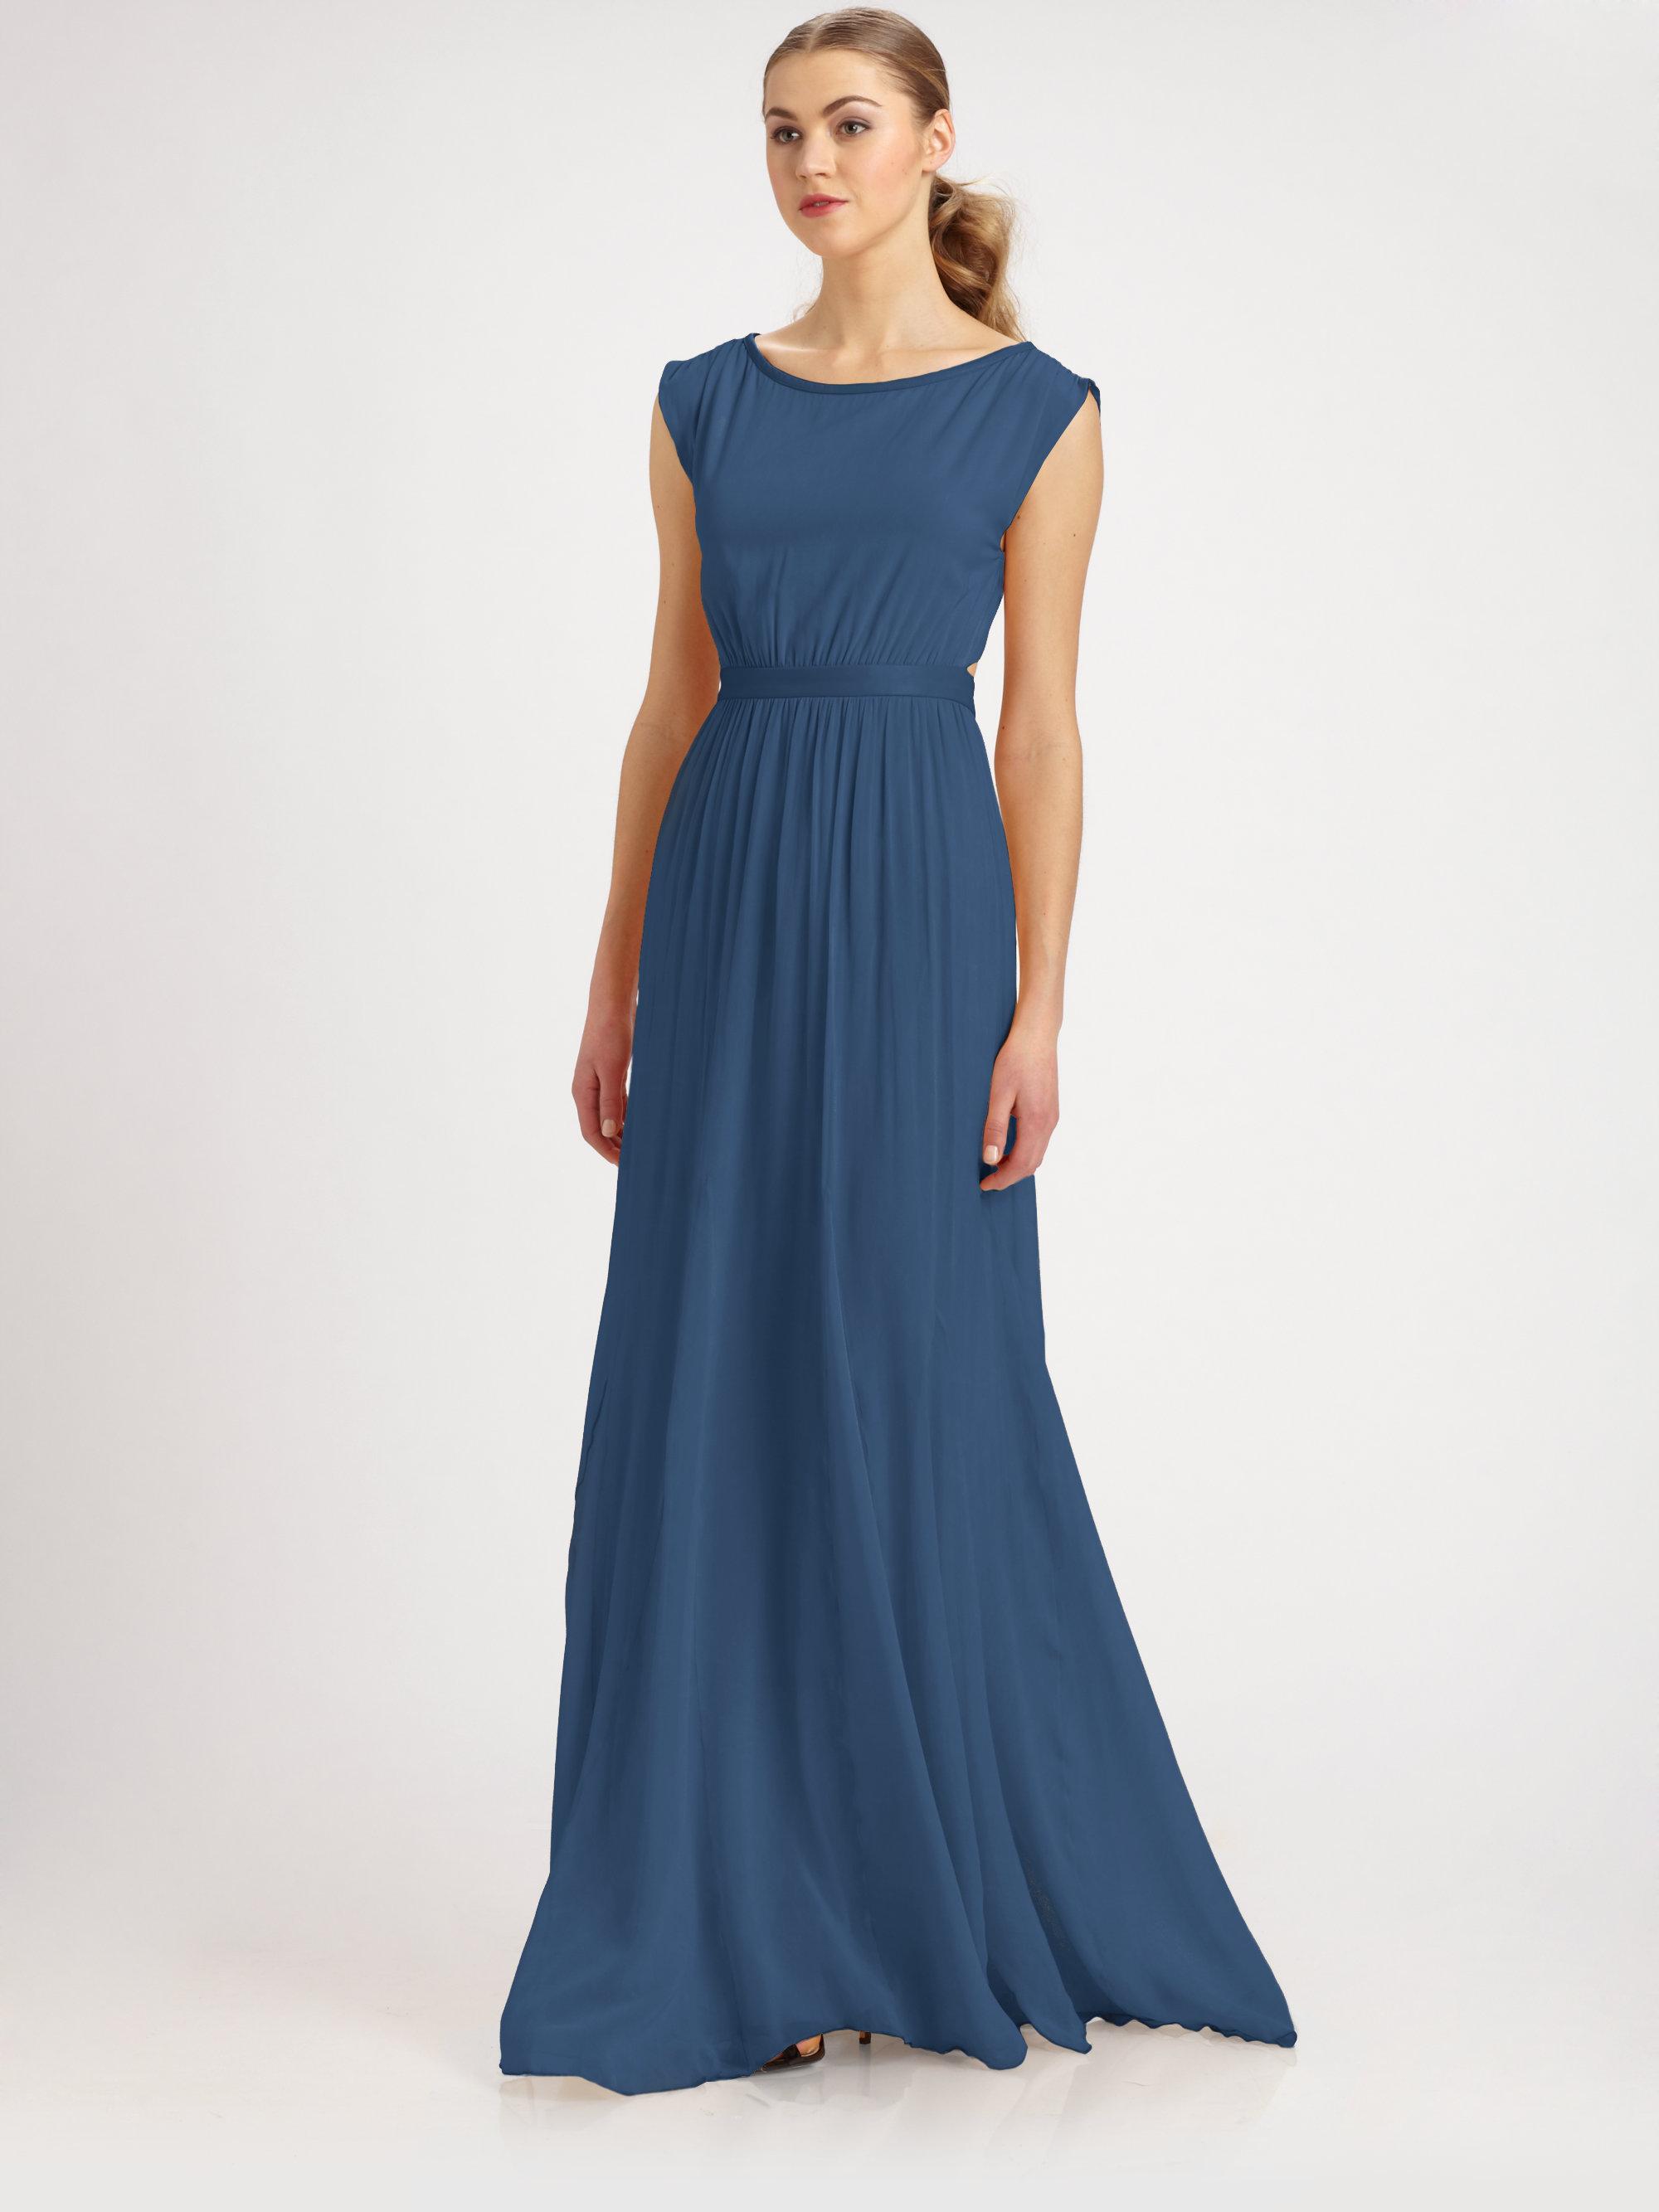 Alice and olivia blue silk dress